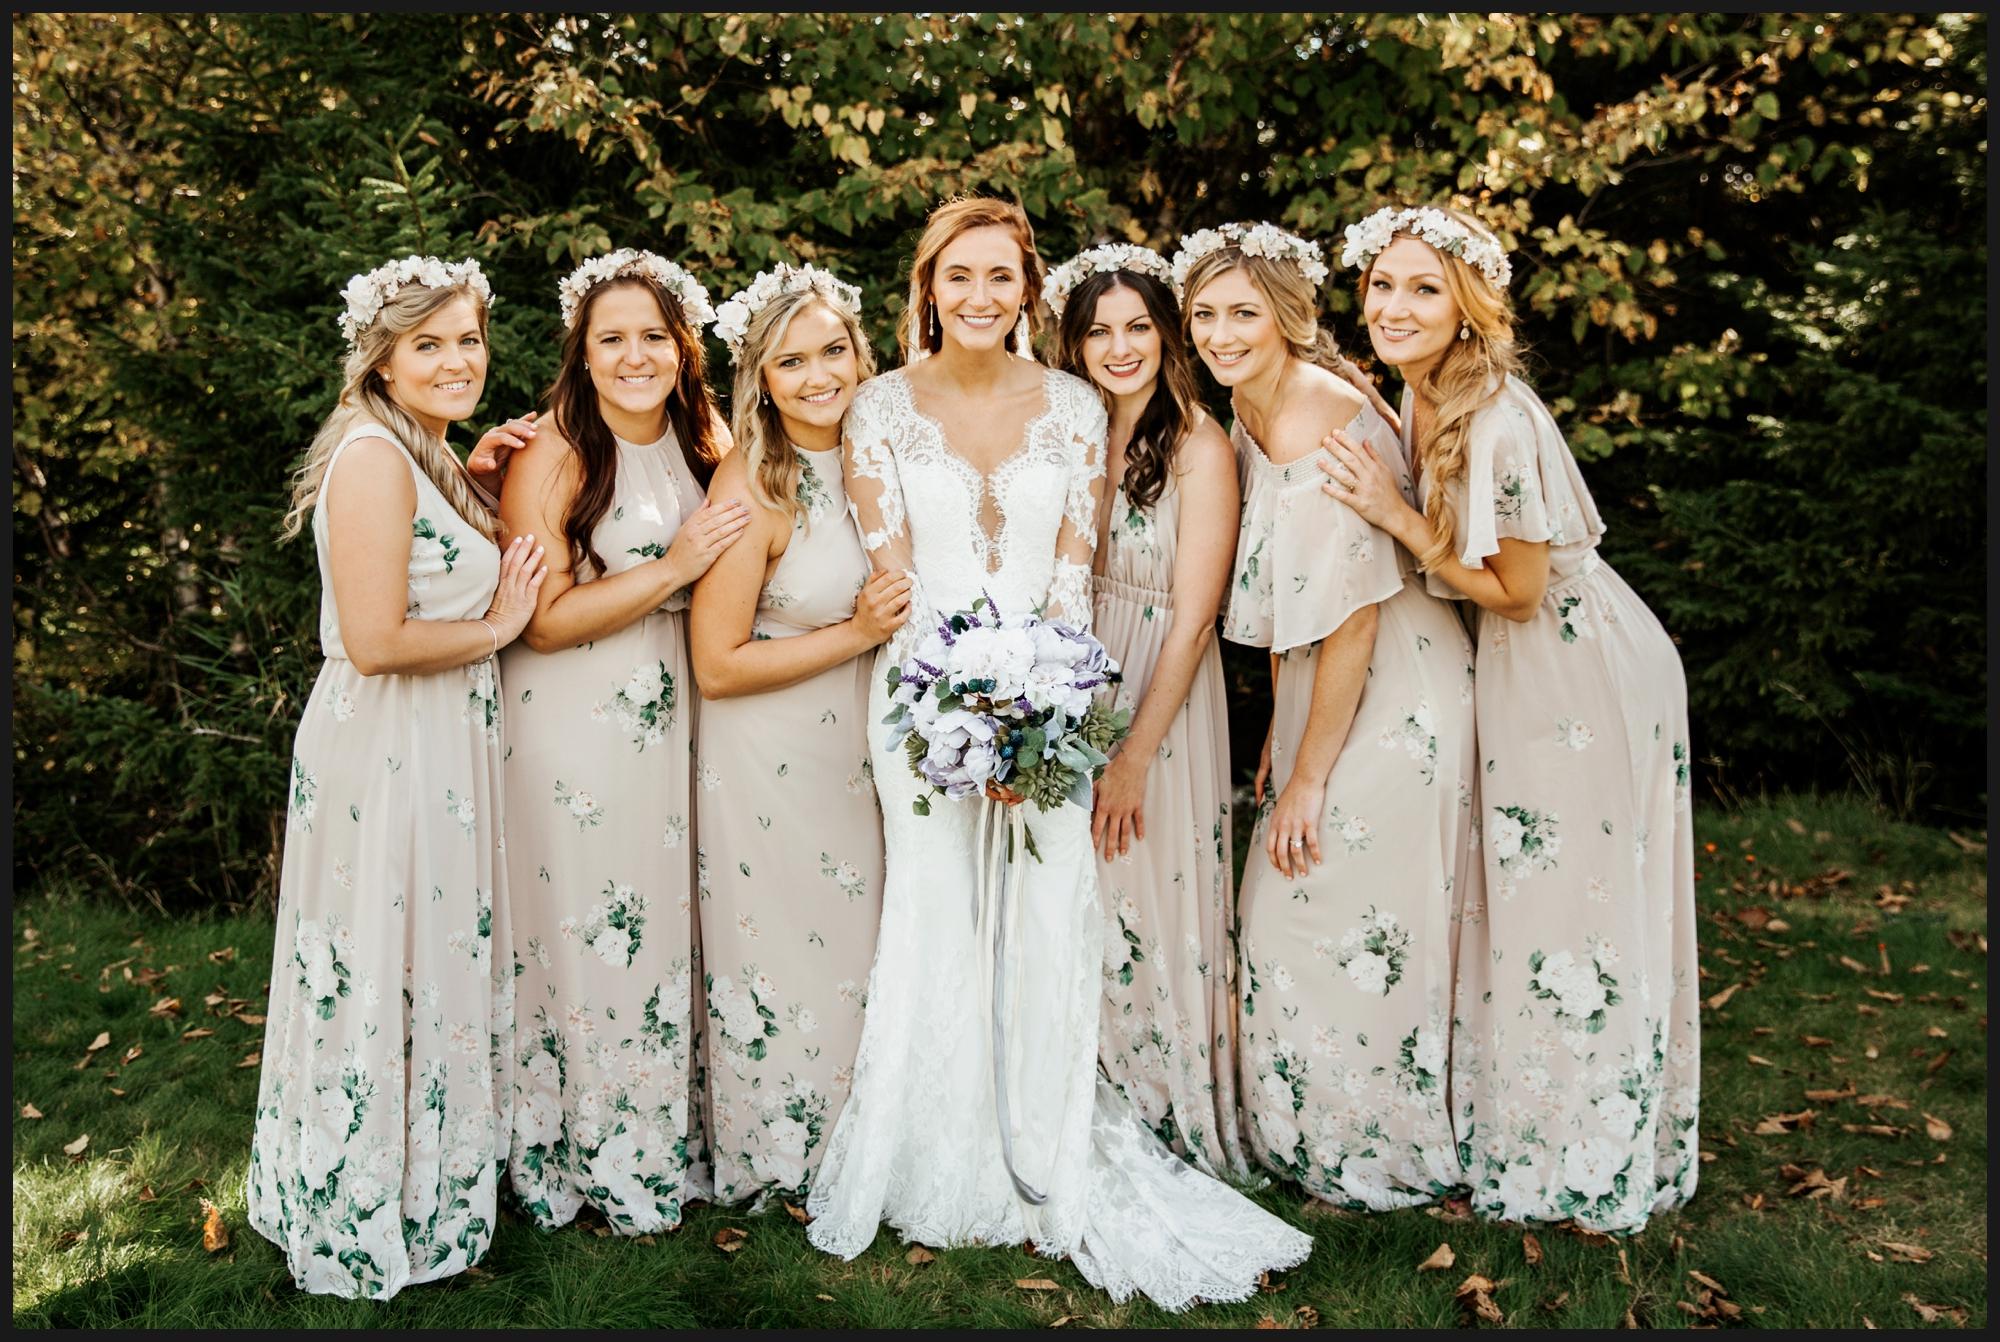 Orlando-Wedding-Photographer-destination-wedding-photographer-florida-wedding-photographer-hawaii-wedding-photographer_0148.jpg